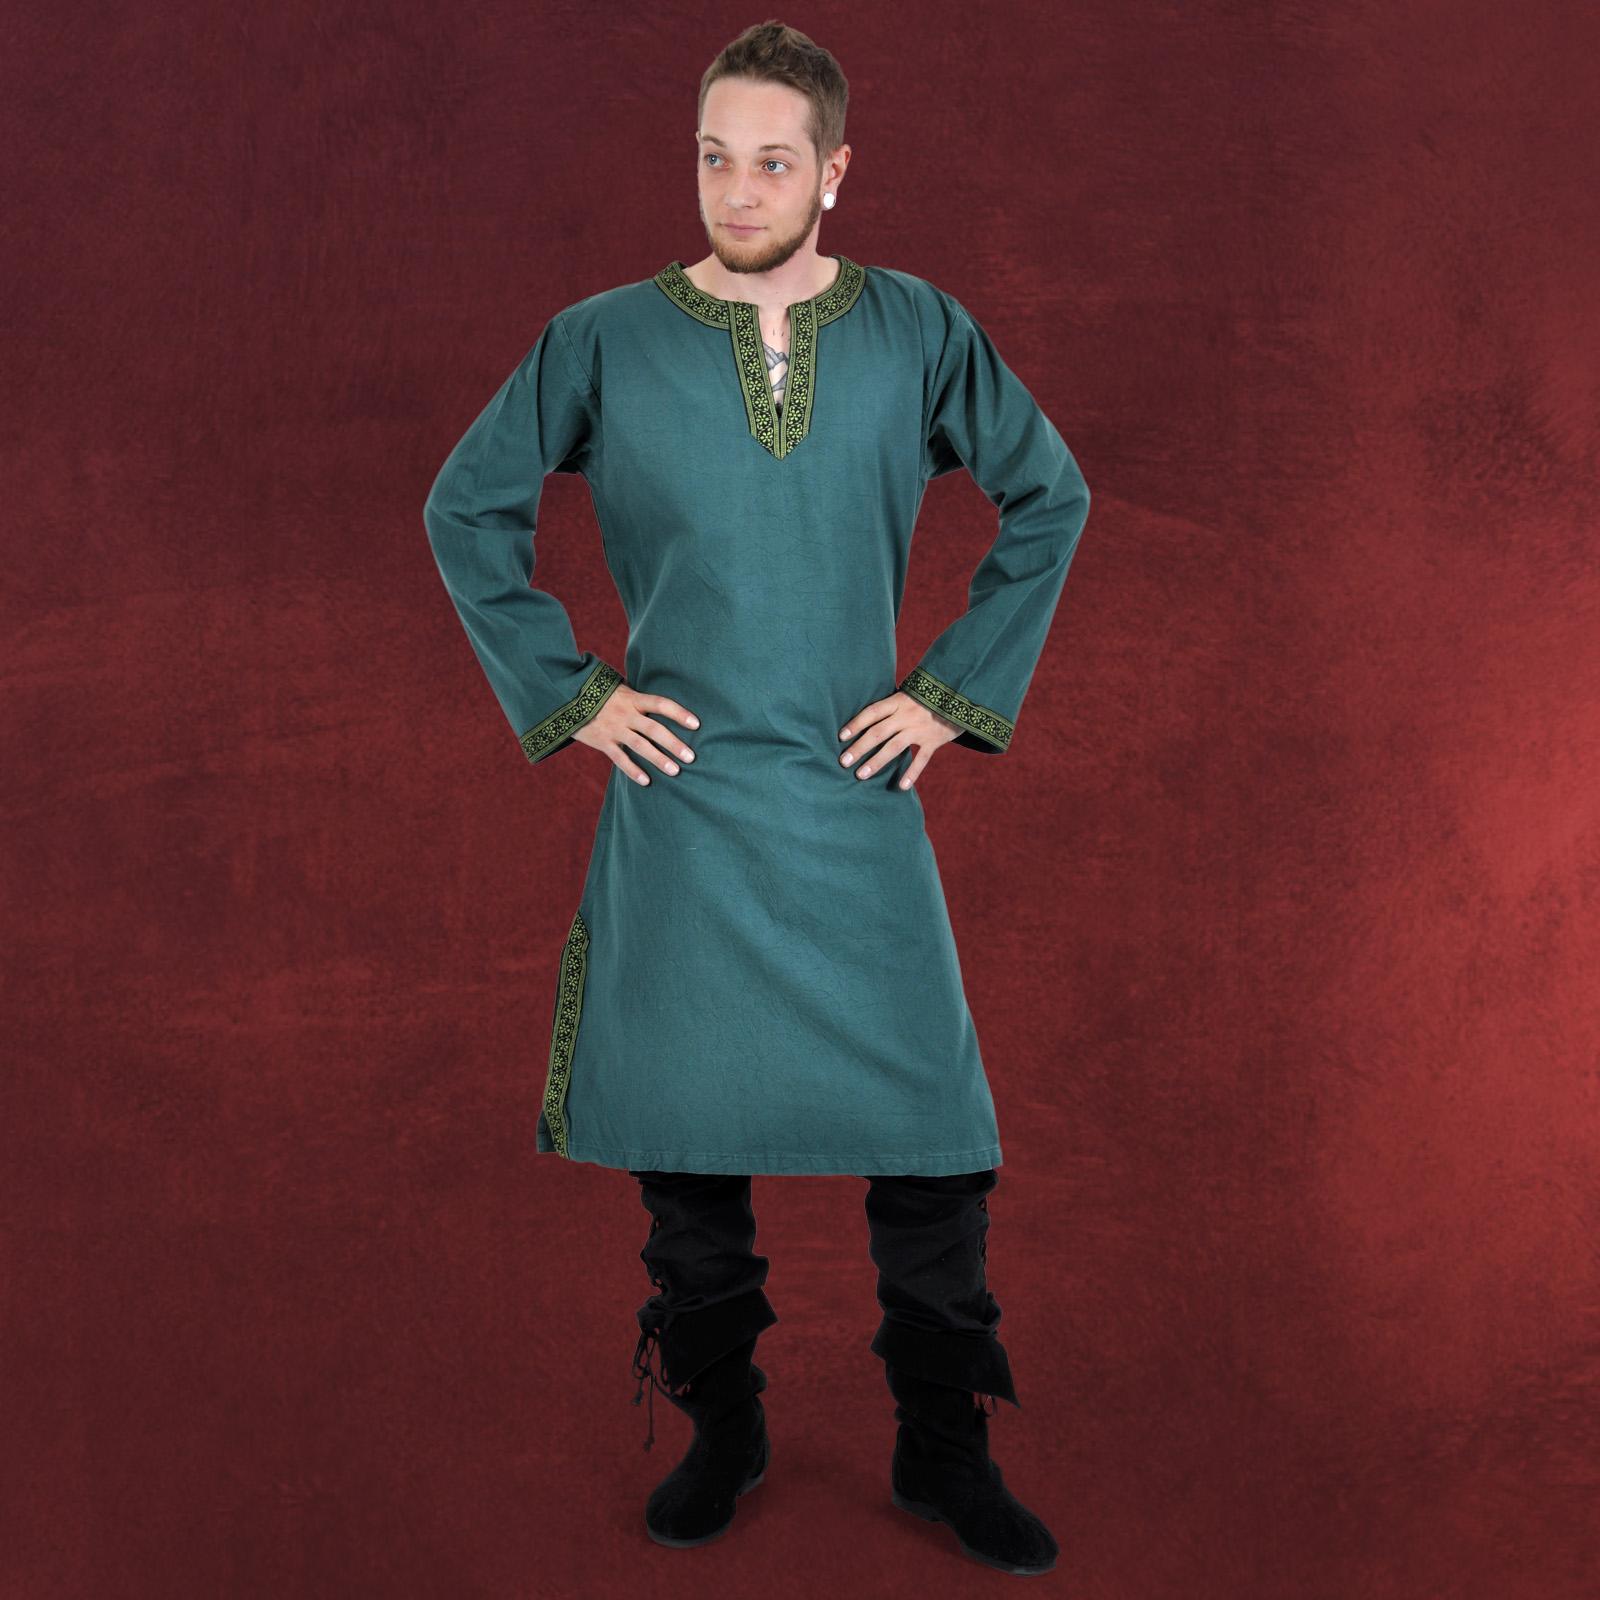 Zu tunika giselbert mit bordüre grün mittelalter gewand herren hemd